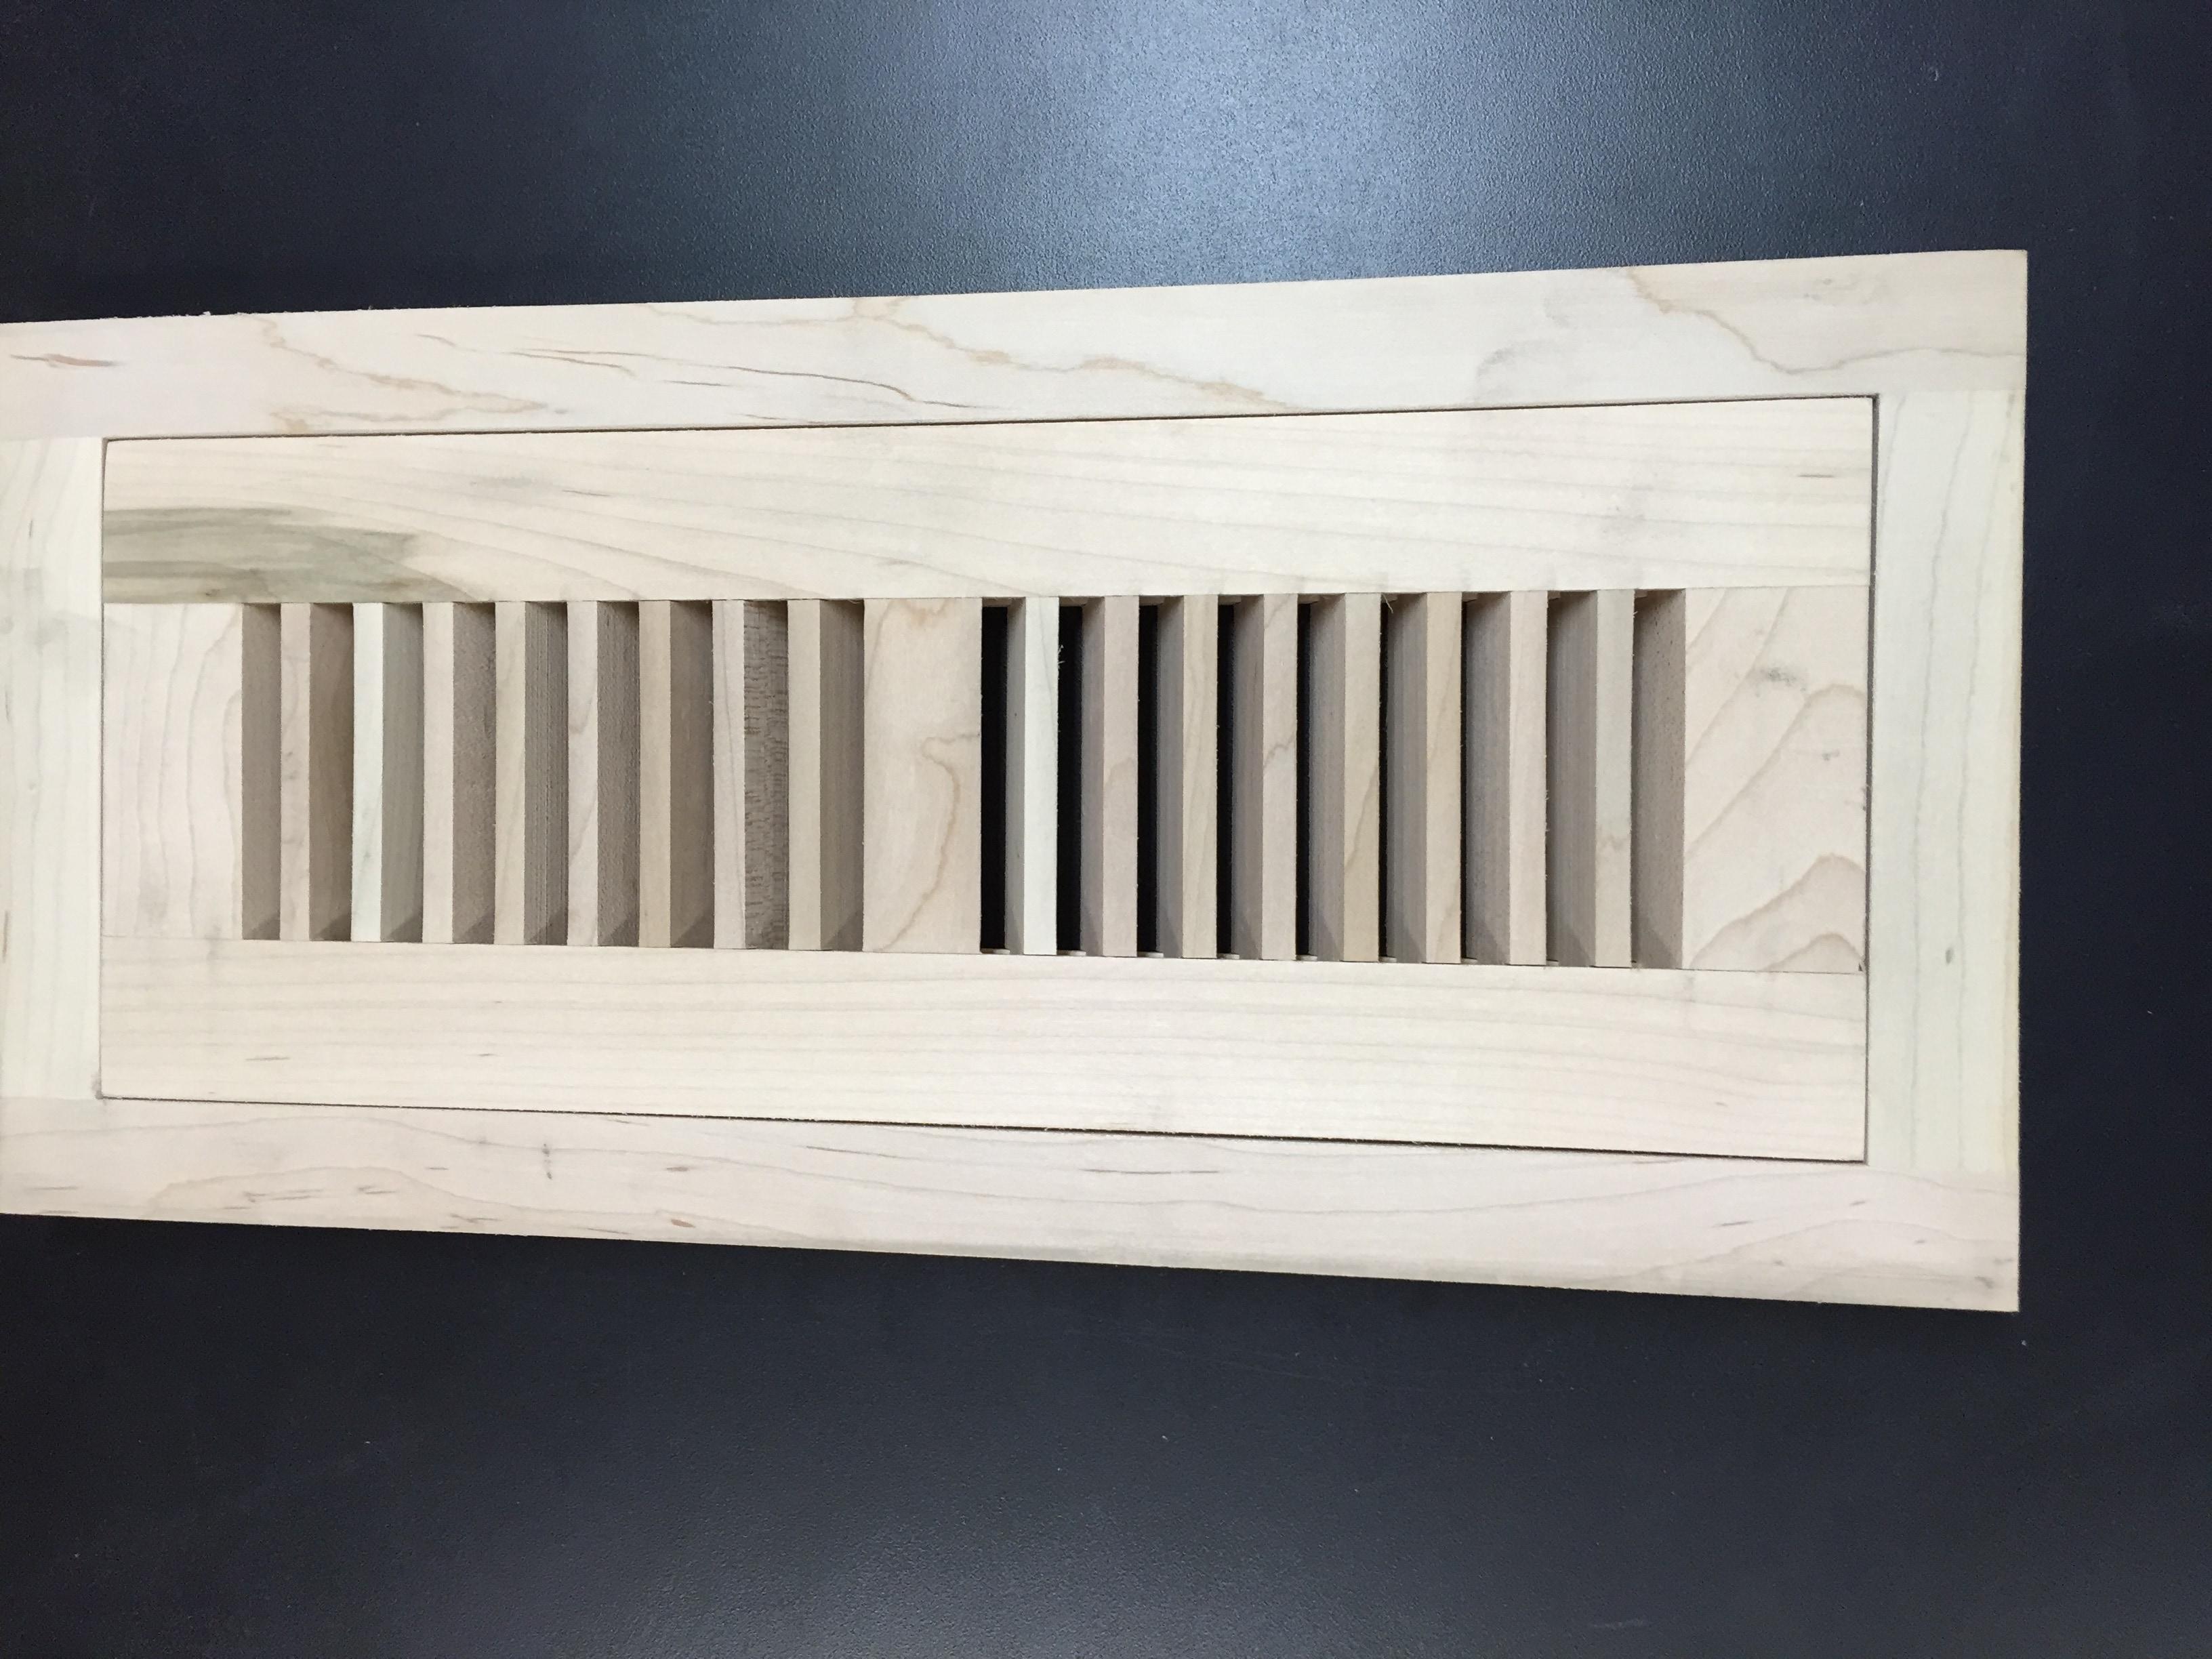 "Flushmount Unfinished Vent / Hard Maple / 4"" X 10"" / Flushmount Vent Floor Molding - Flush Mount Hardwood Floor Vents 0"